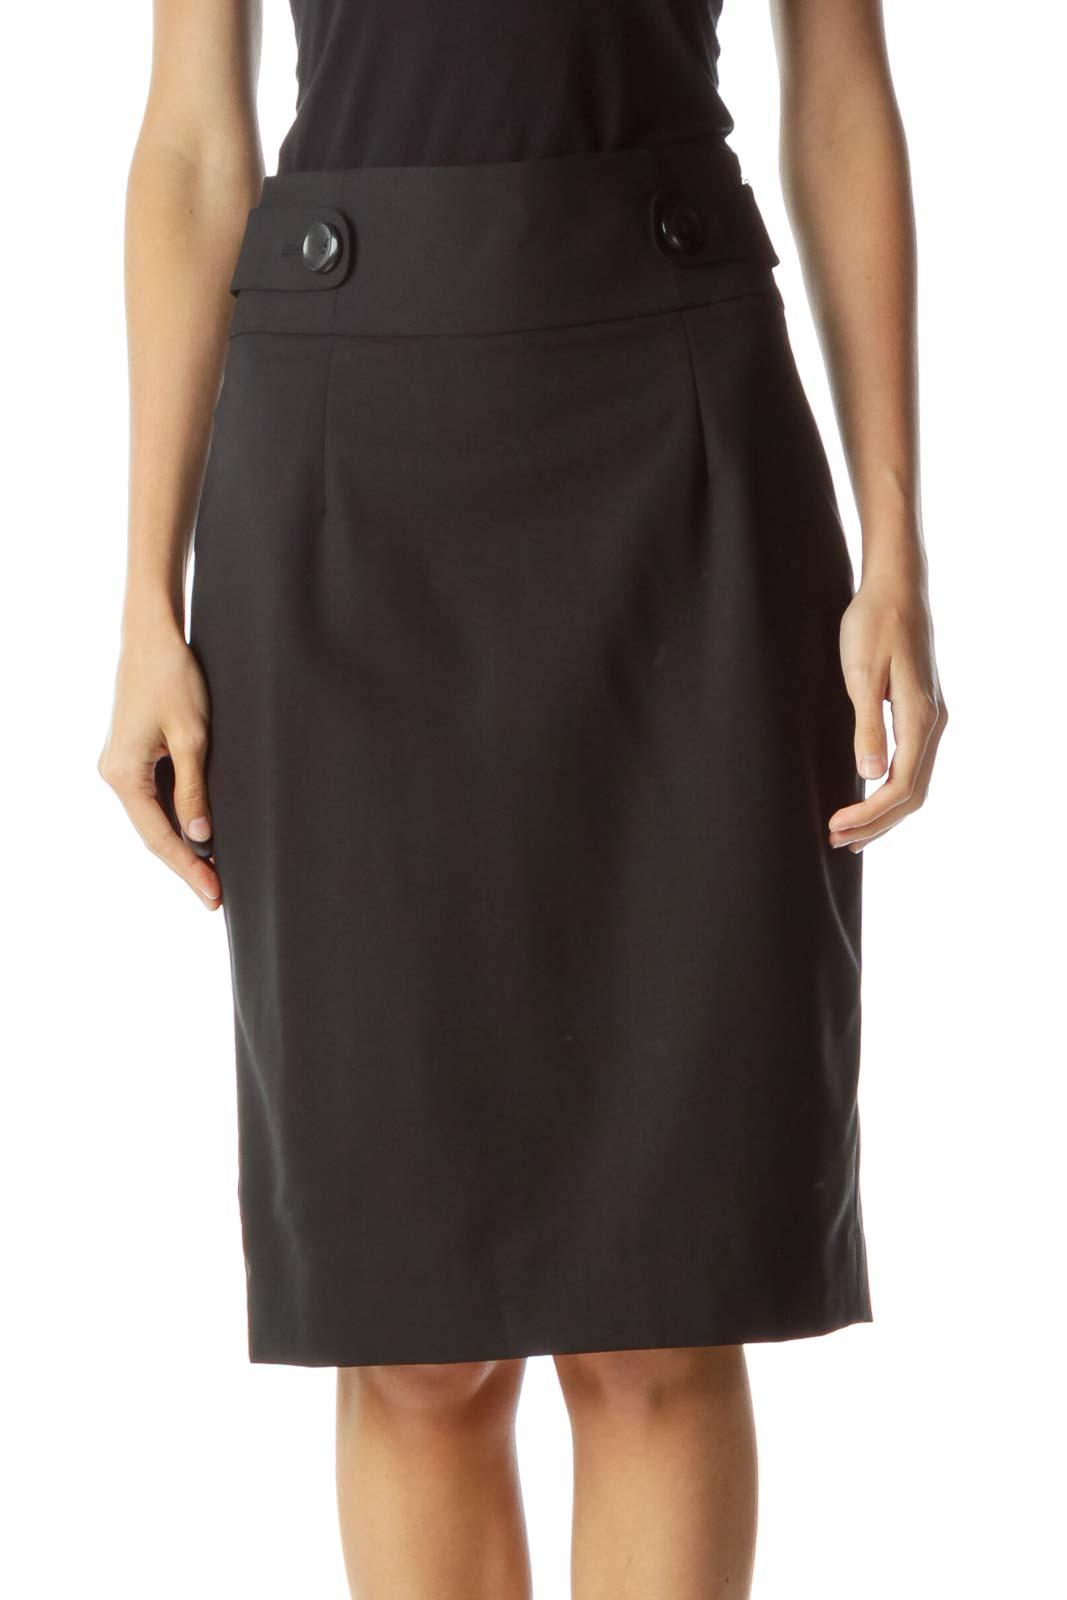 Black Buttoned Pencil Skirt